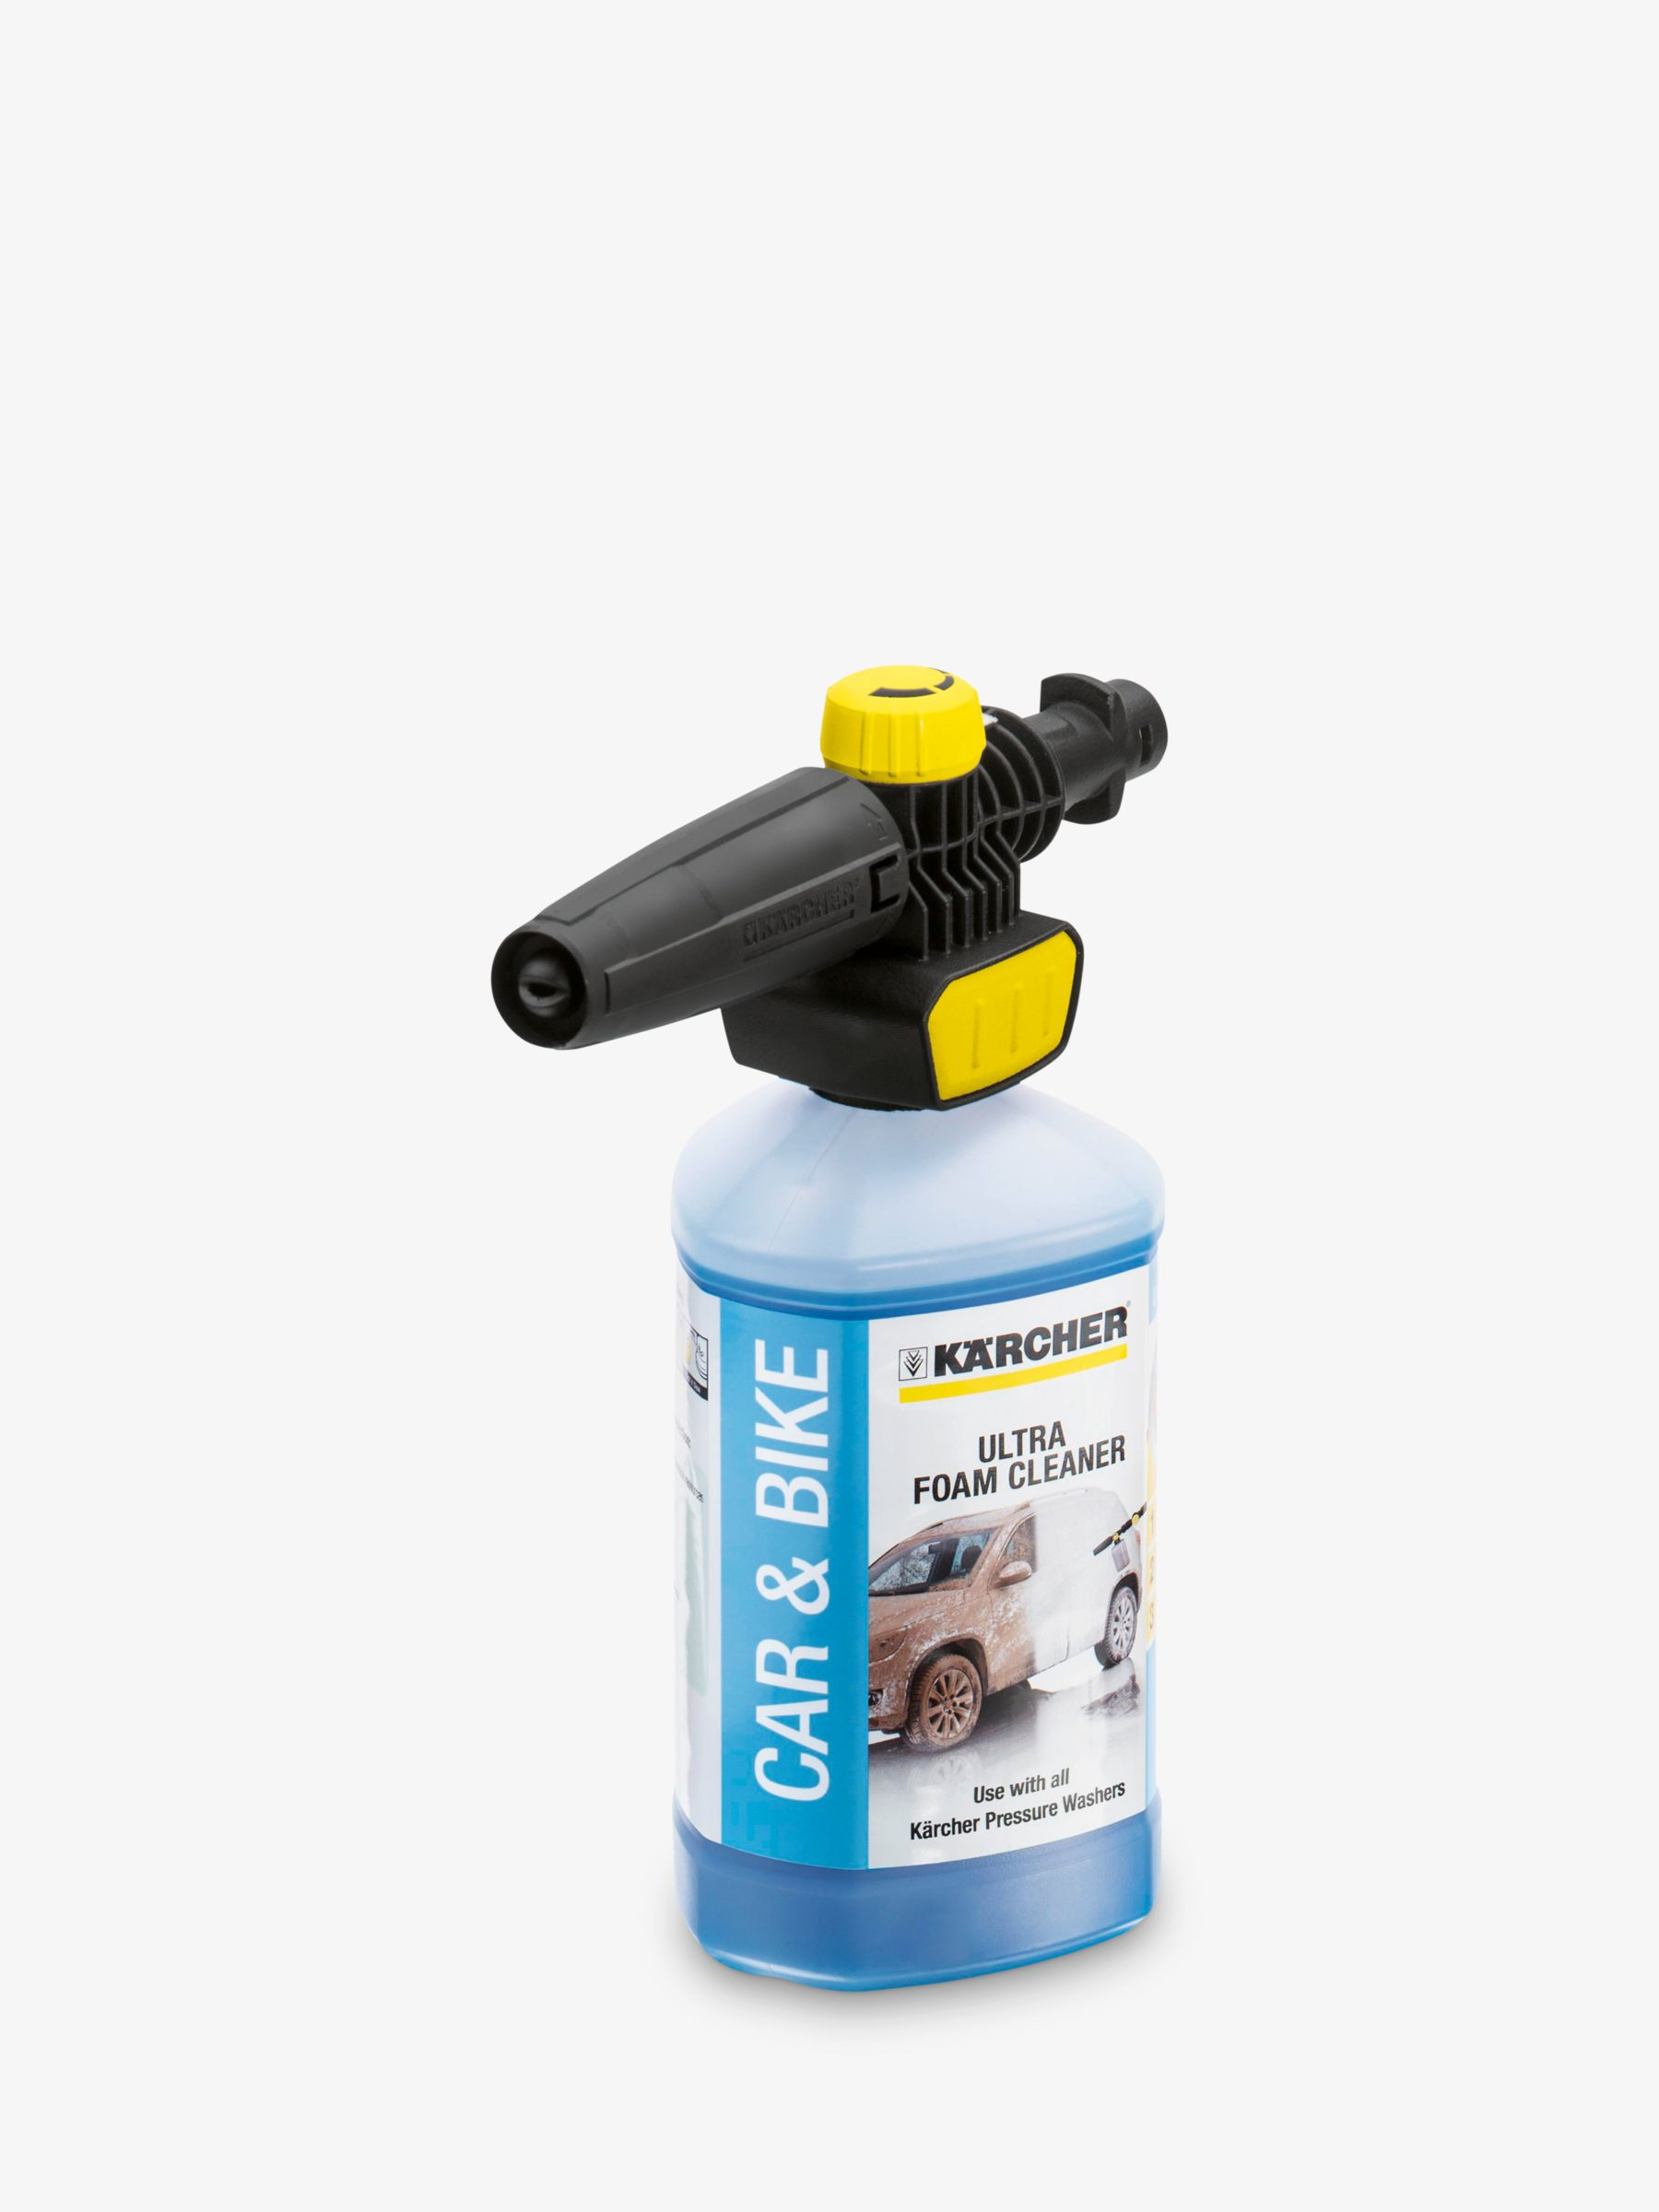 Karcher Kärcher FJ10 Connect 'n' Clean Foam Jet & Car Shampoo Kit